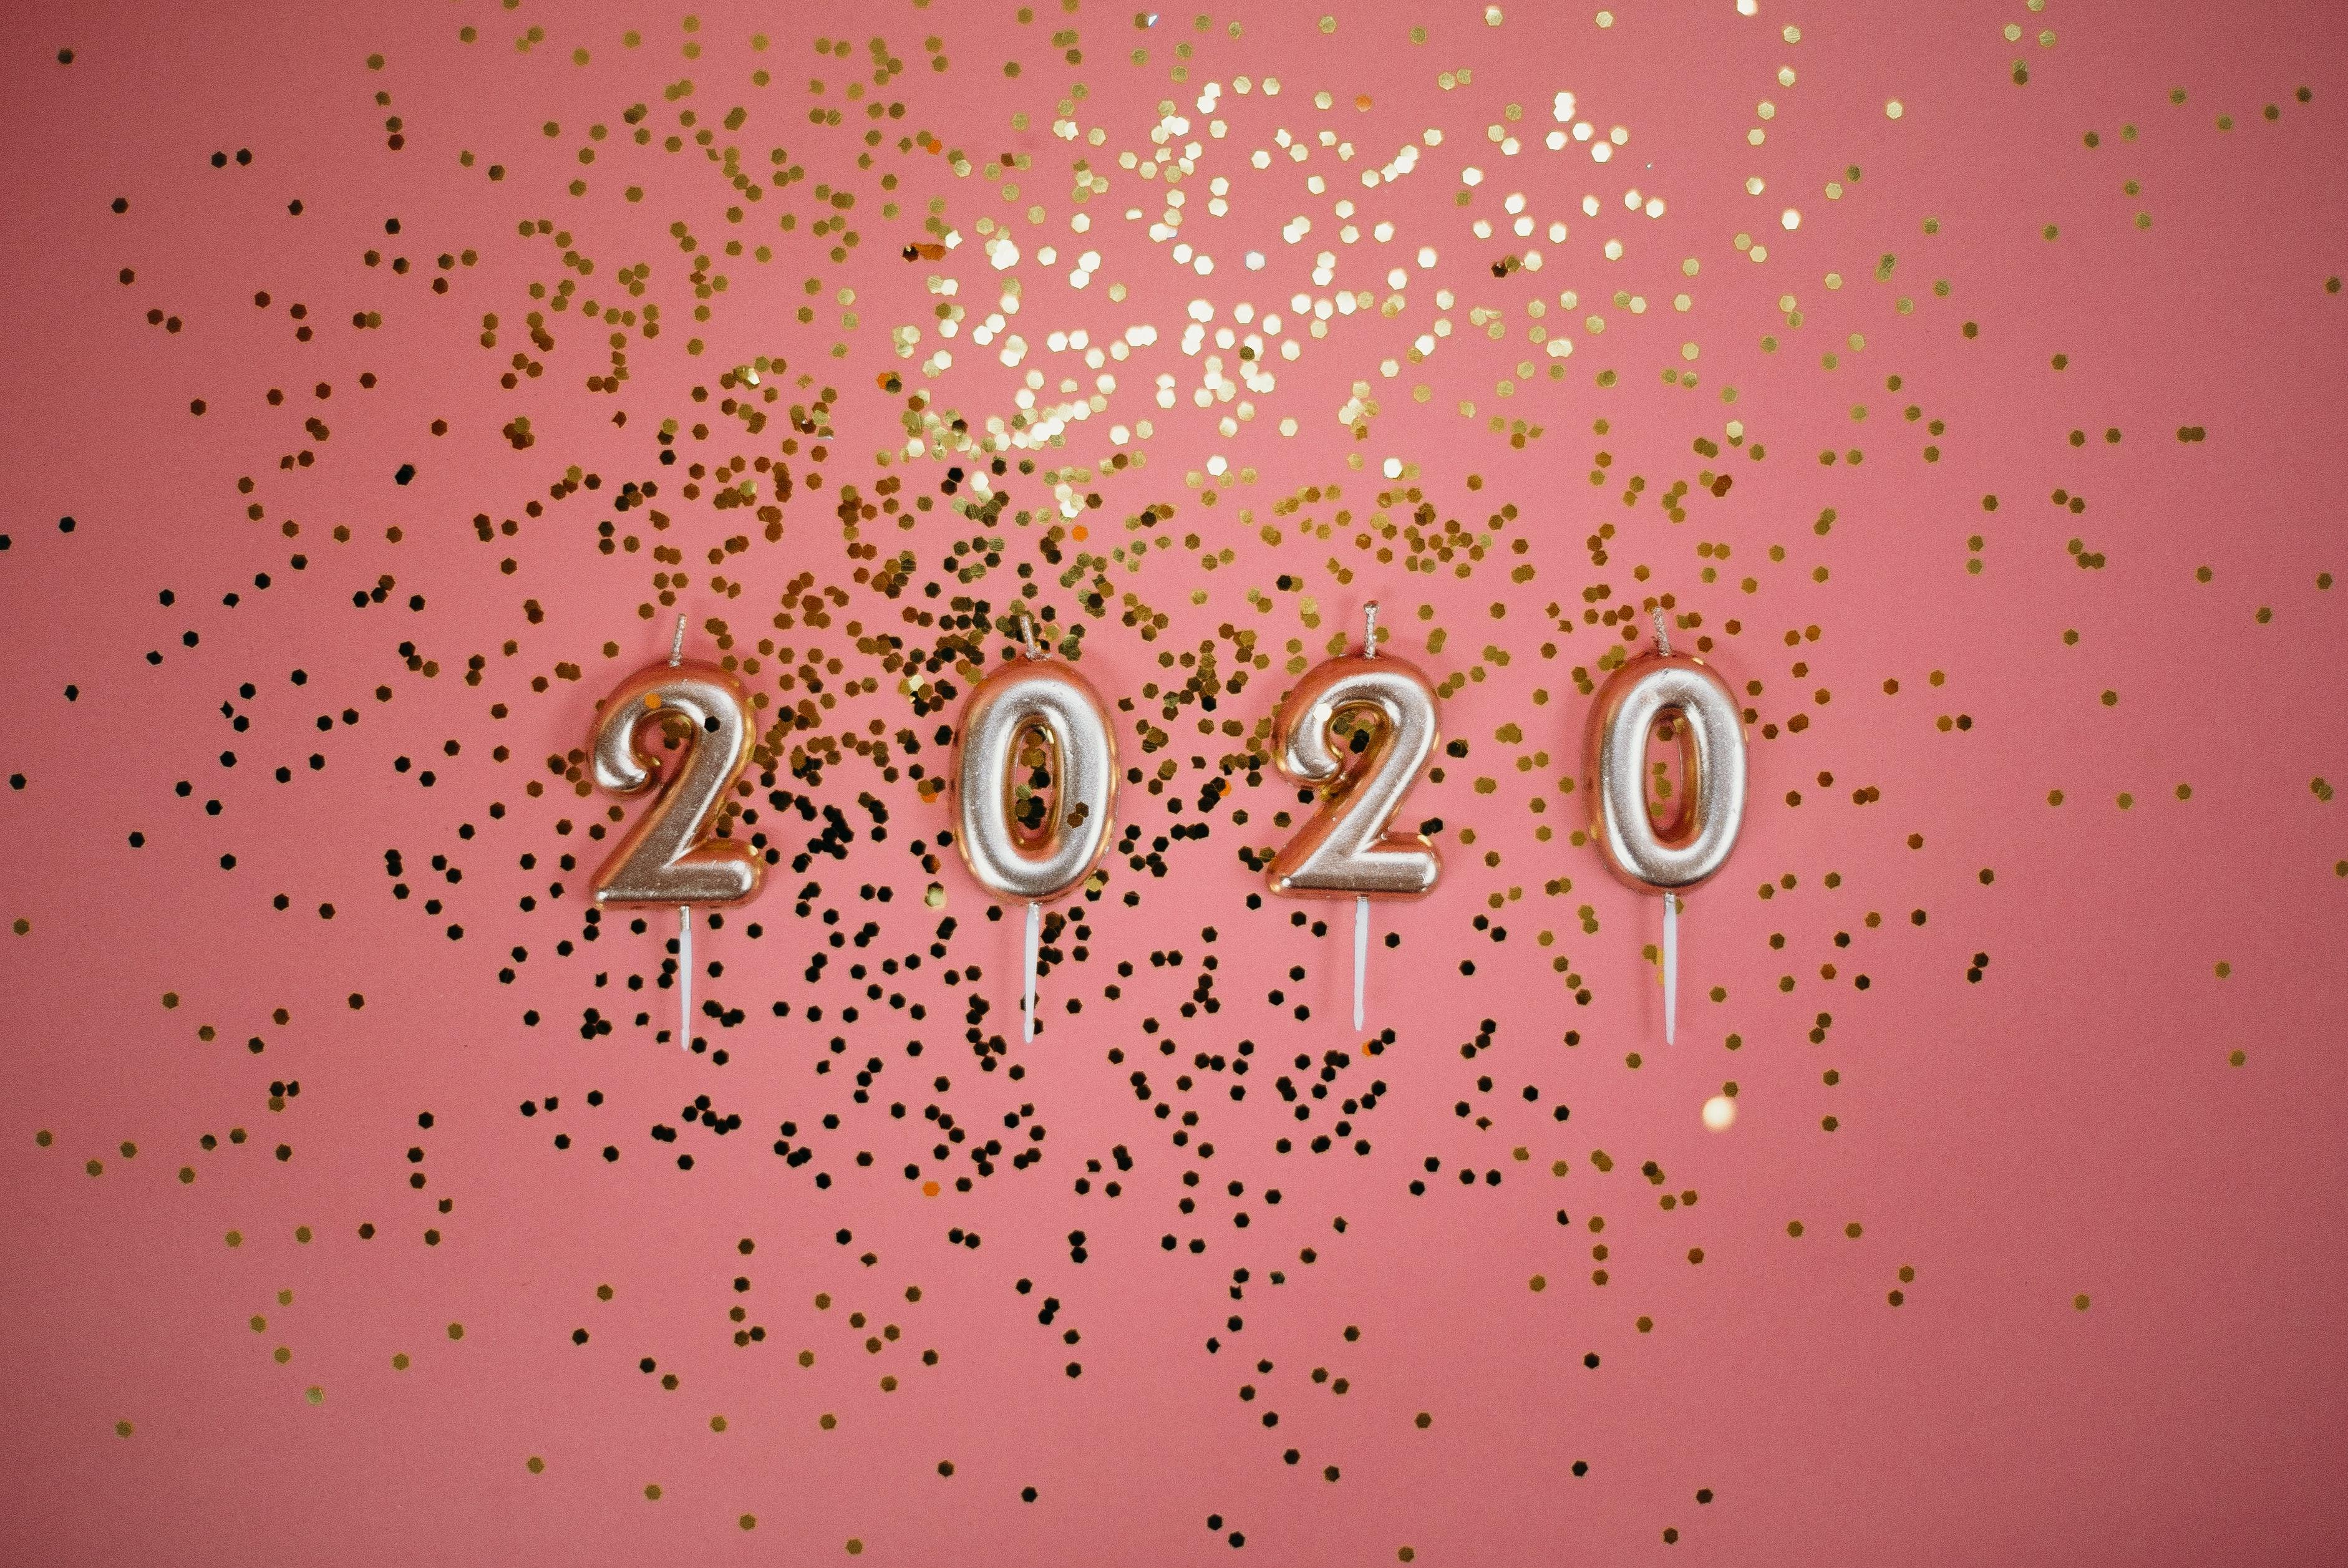 2020_trend.jpg